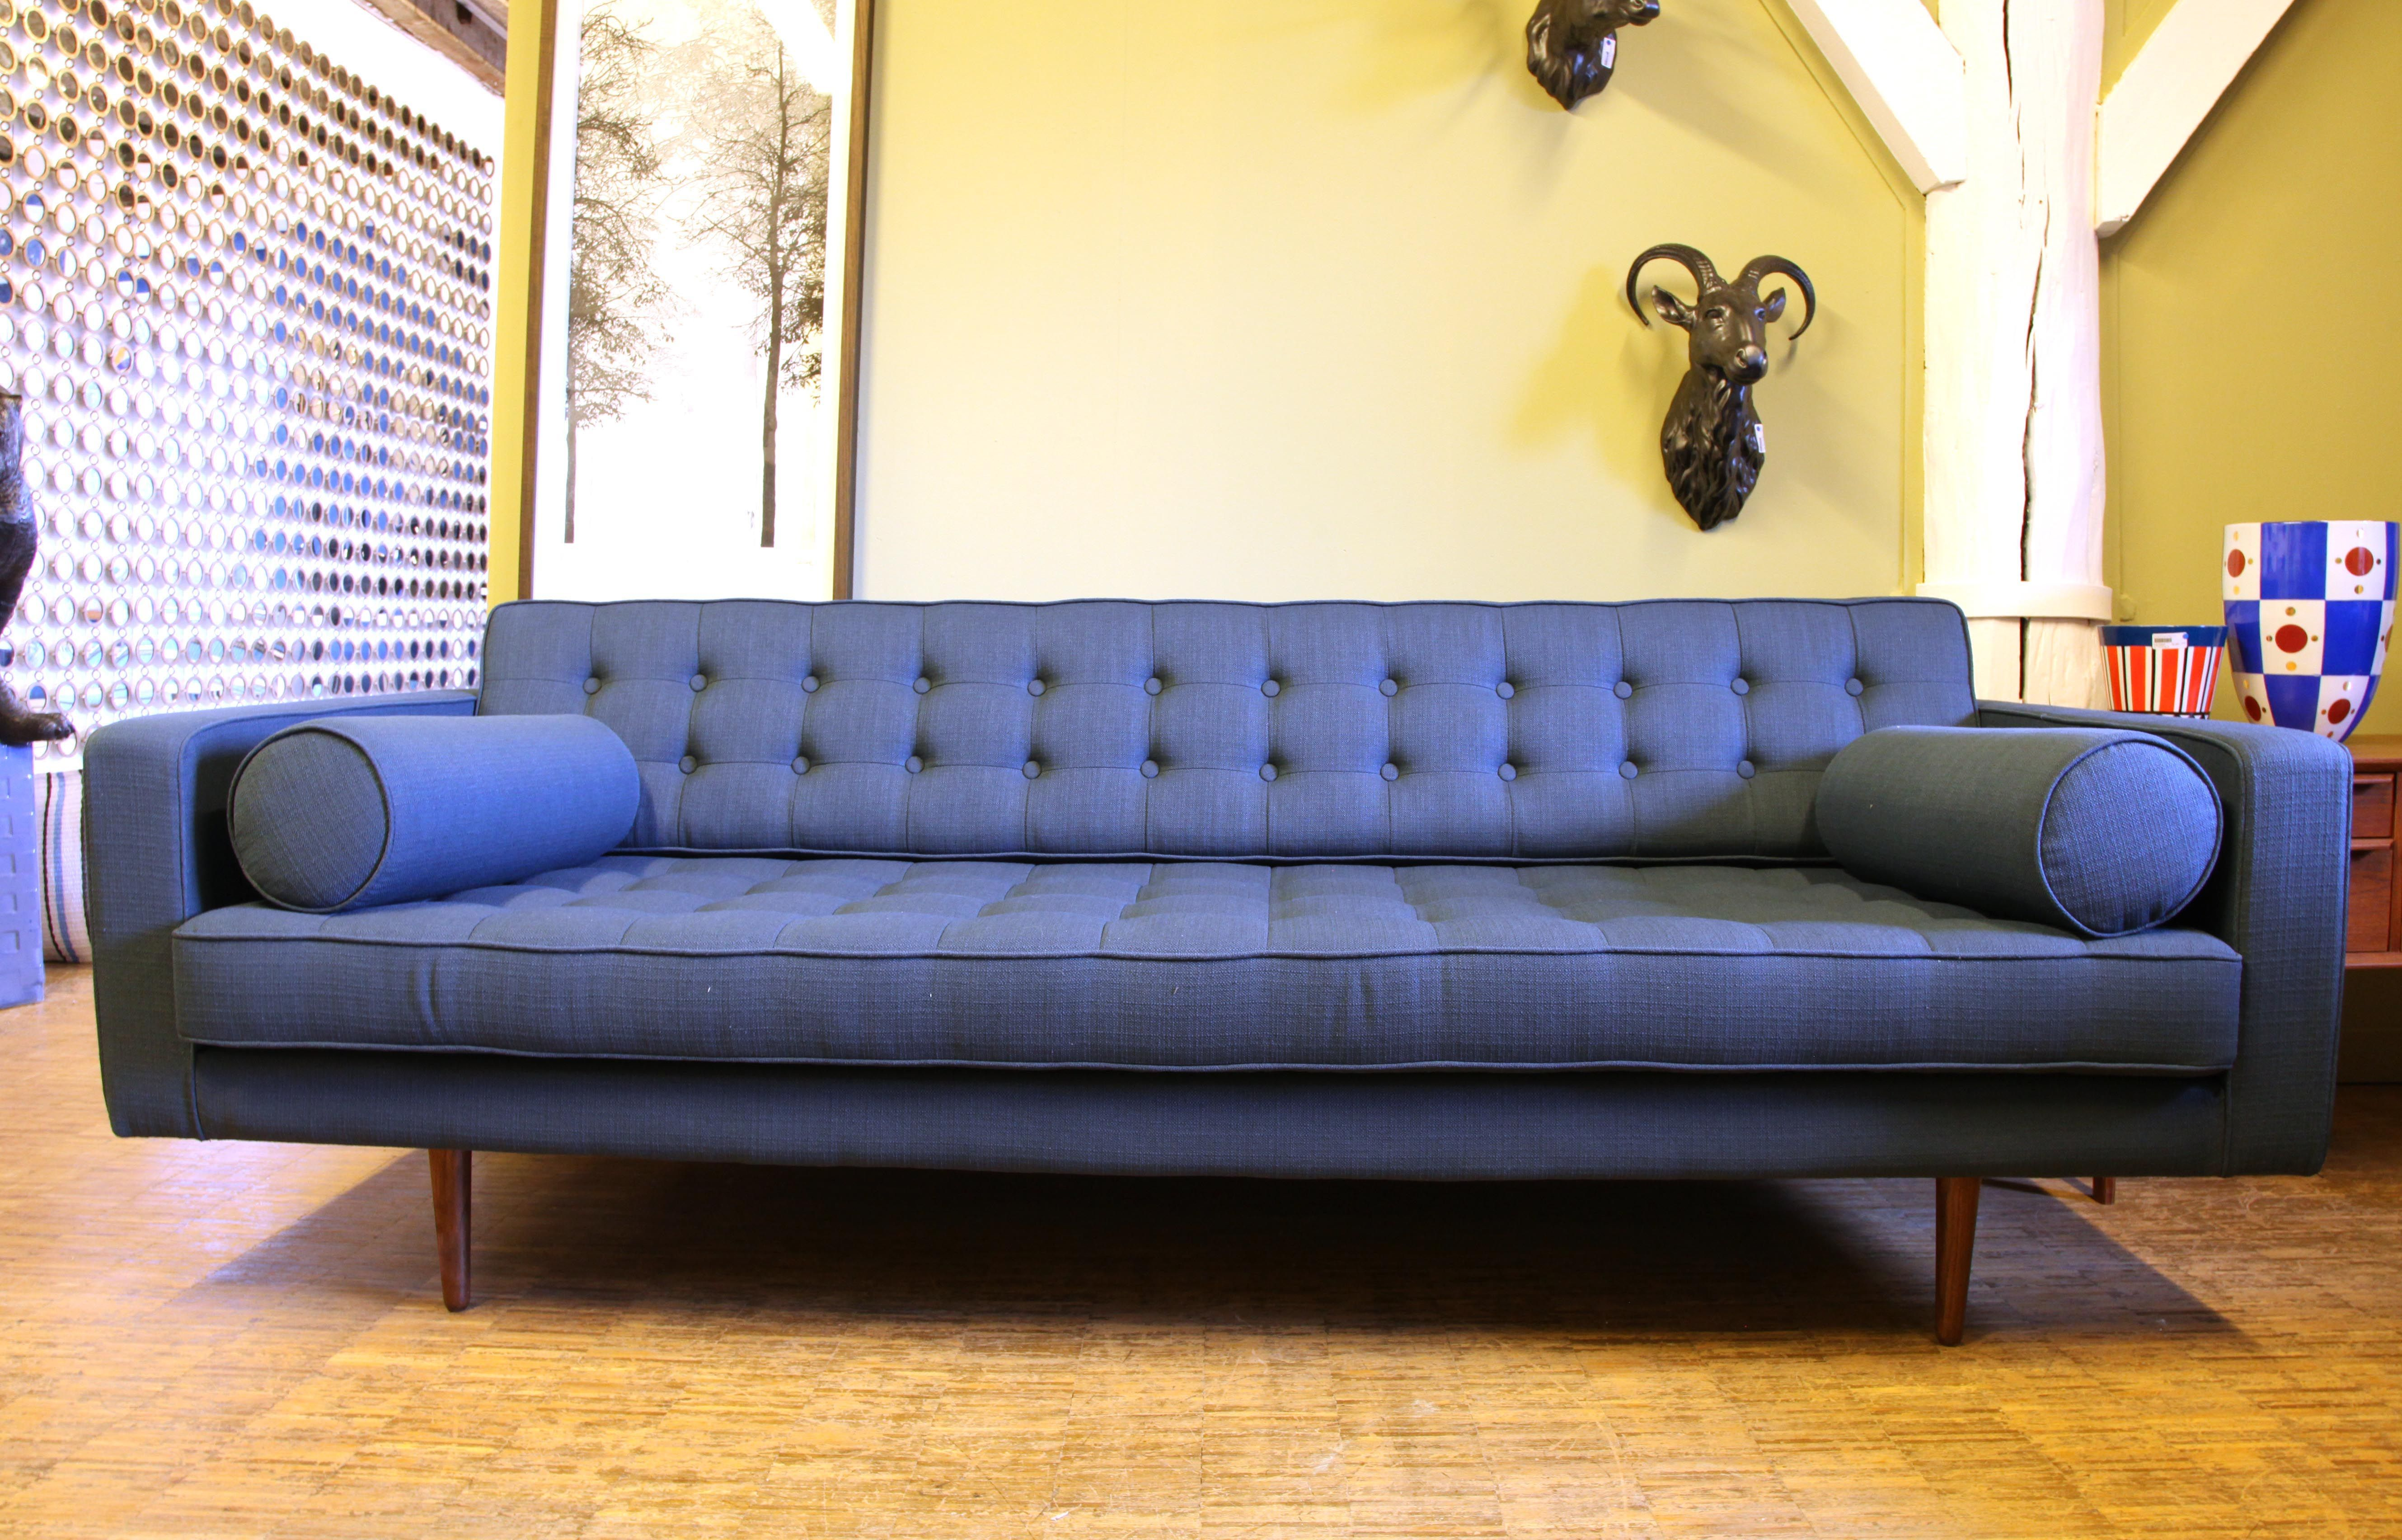 canap droit 3 places l 215 cm bleu m tal made in design editions. Black Bedroom Furniture Sets. Home Design Ideas